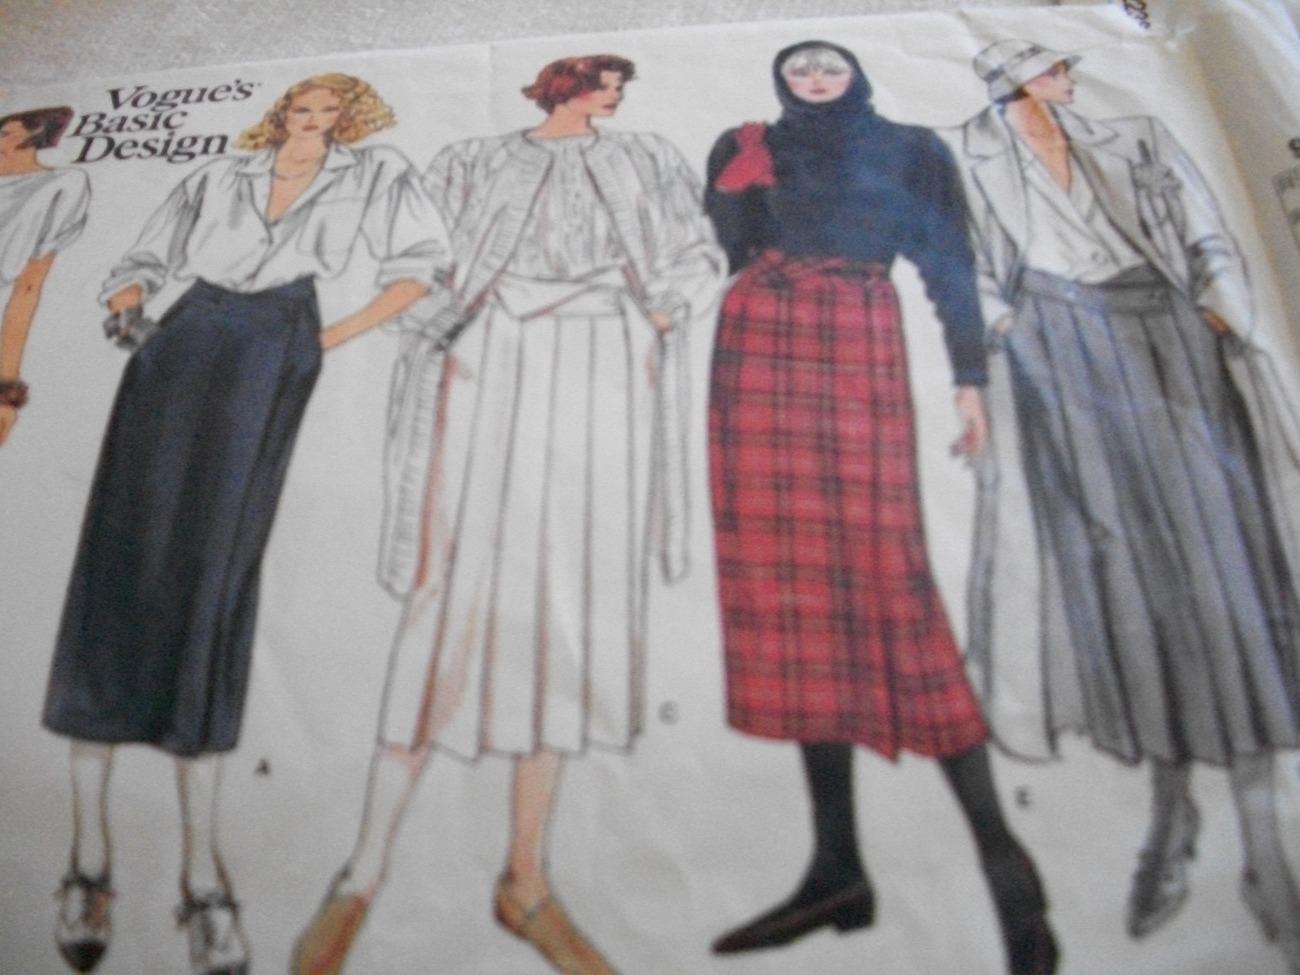 Woman's Skirt Pattern Vogue Basic Design 1466